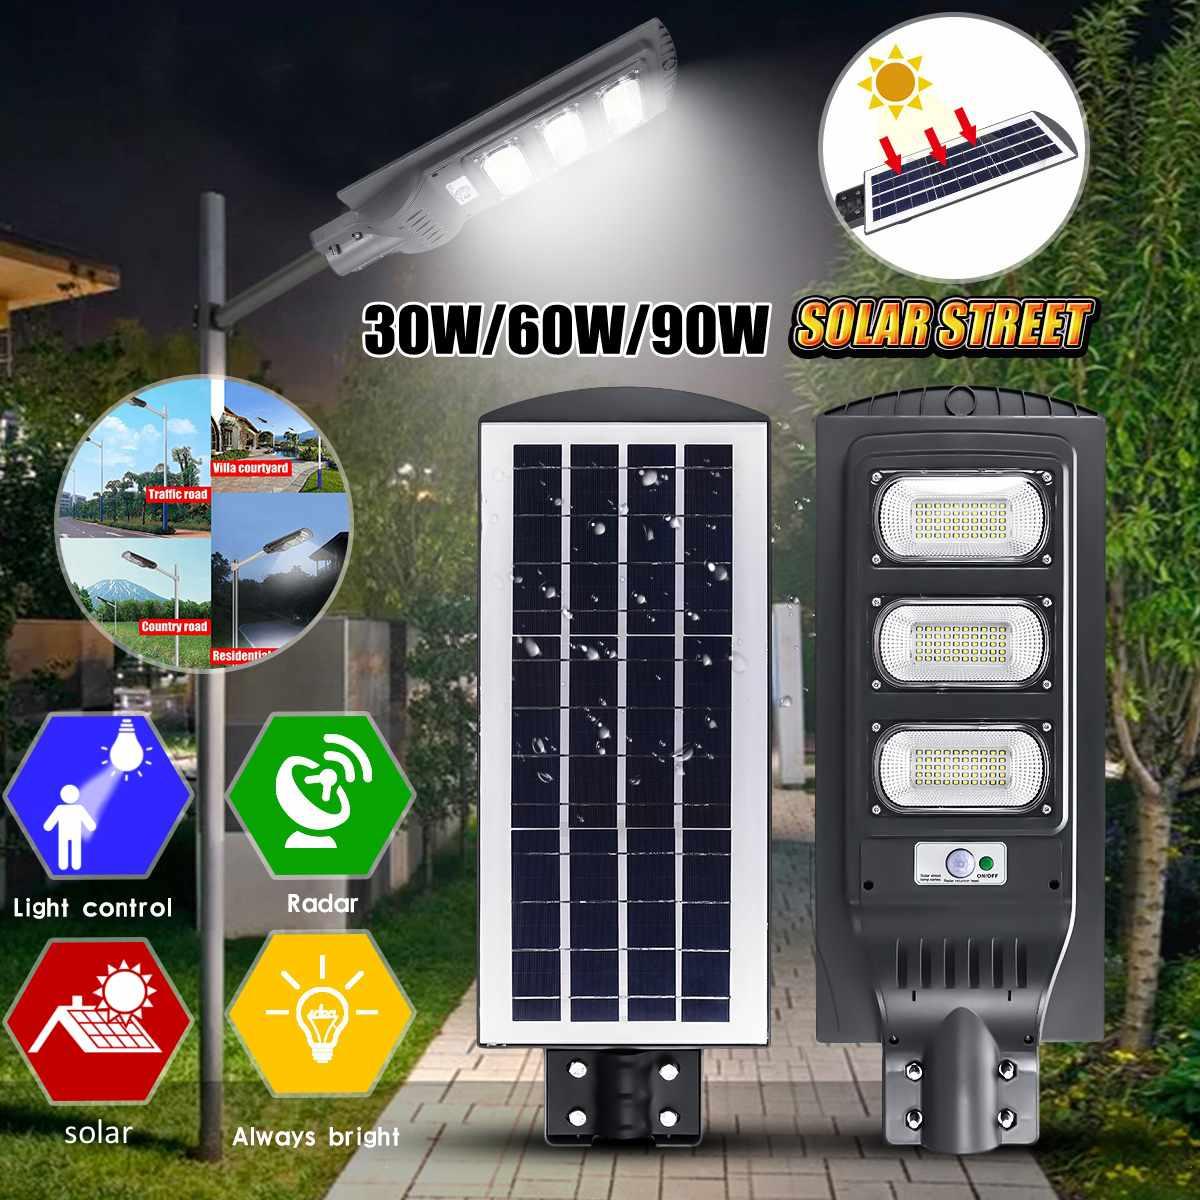 30W/60W/90W LED PIR Solar Street Light Outdoor Waterproof IP65 Radar Sensor Light Control Solar Powered Led Yard Street Lamp